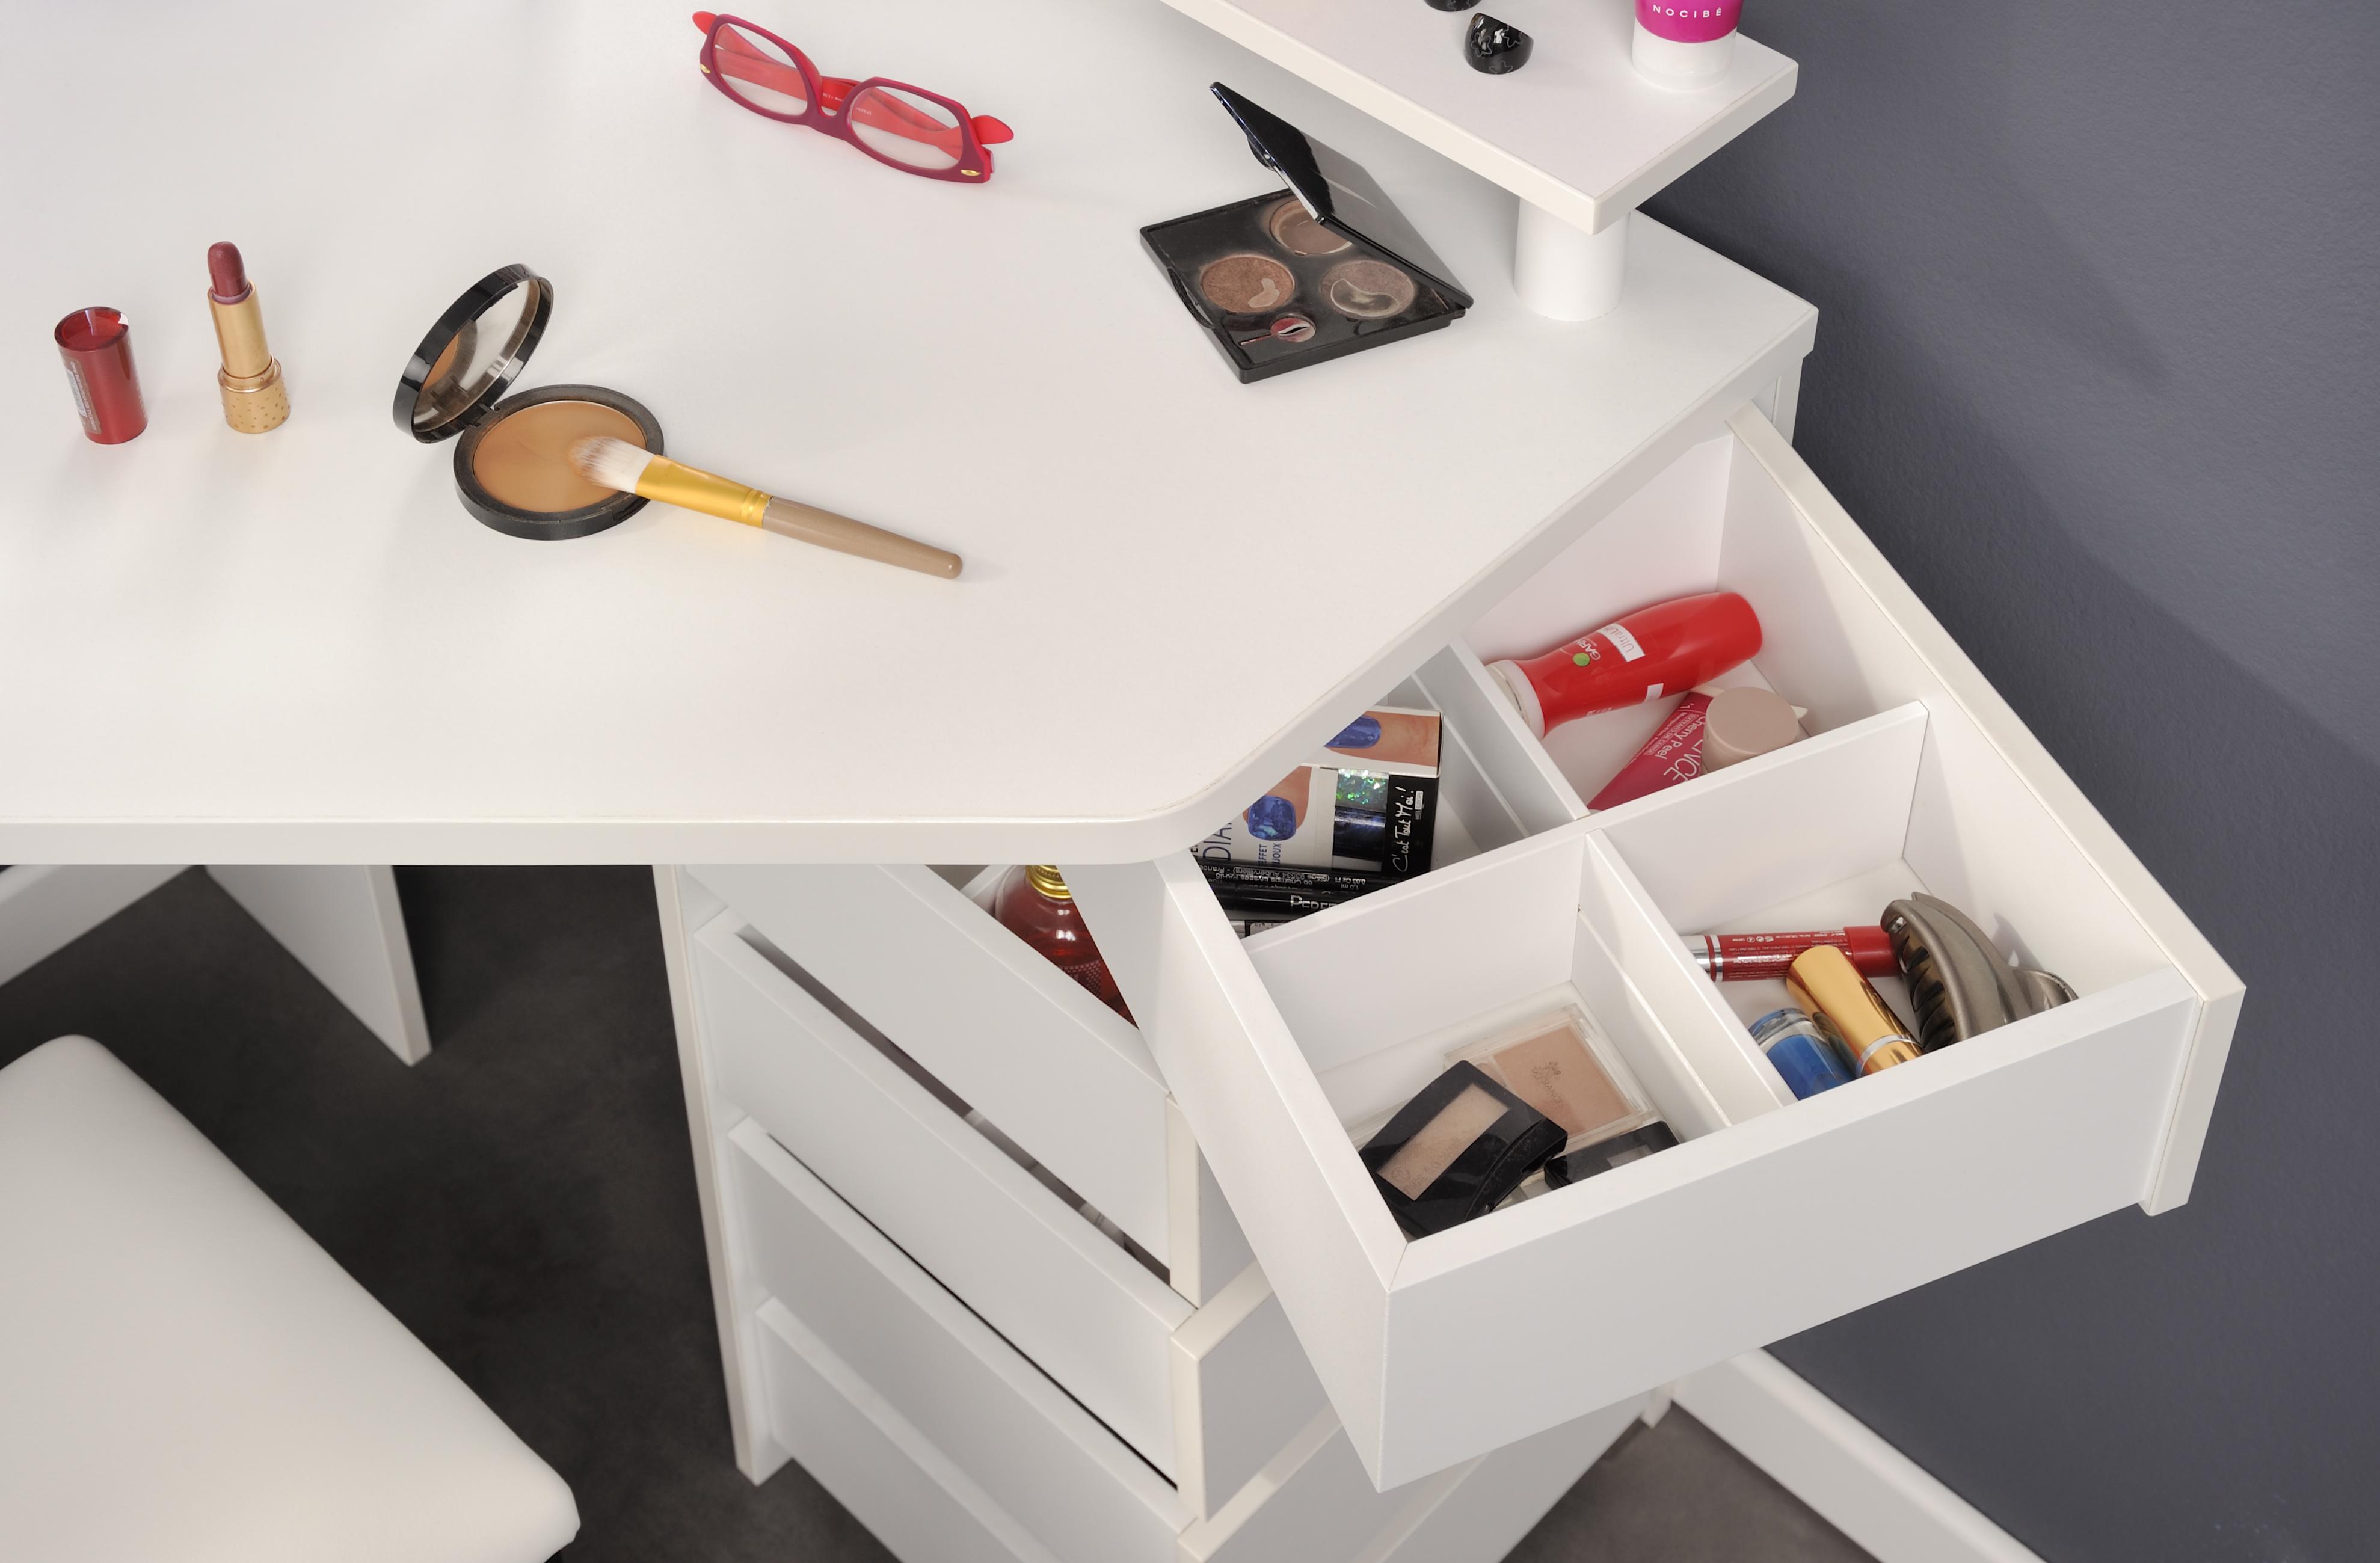 eck schminktisch inkl led beleuchtung volage 11 von parisot wei. Black Bedroom Furniture Sets. Home Design Ideas